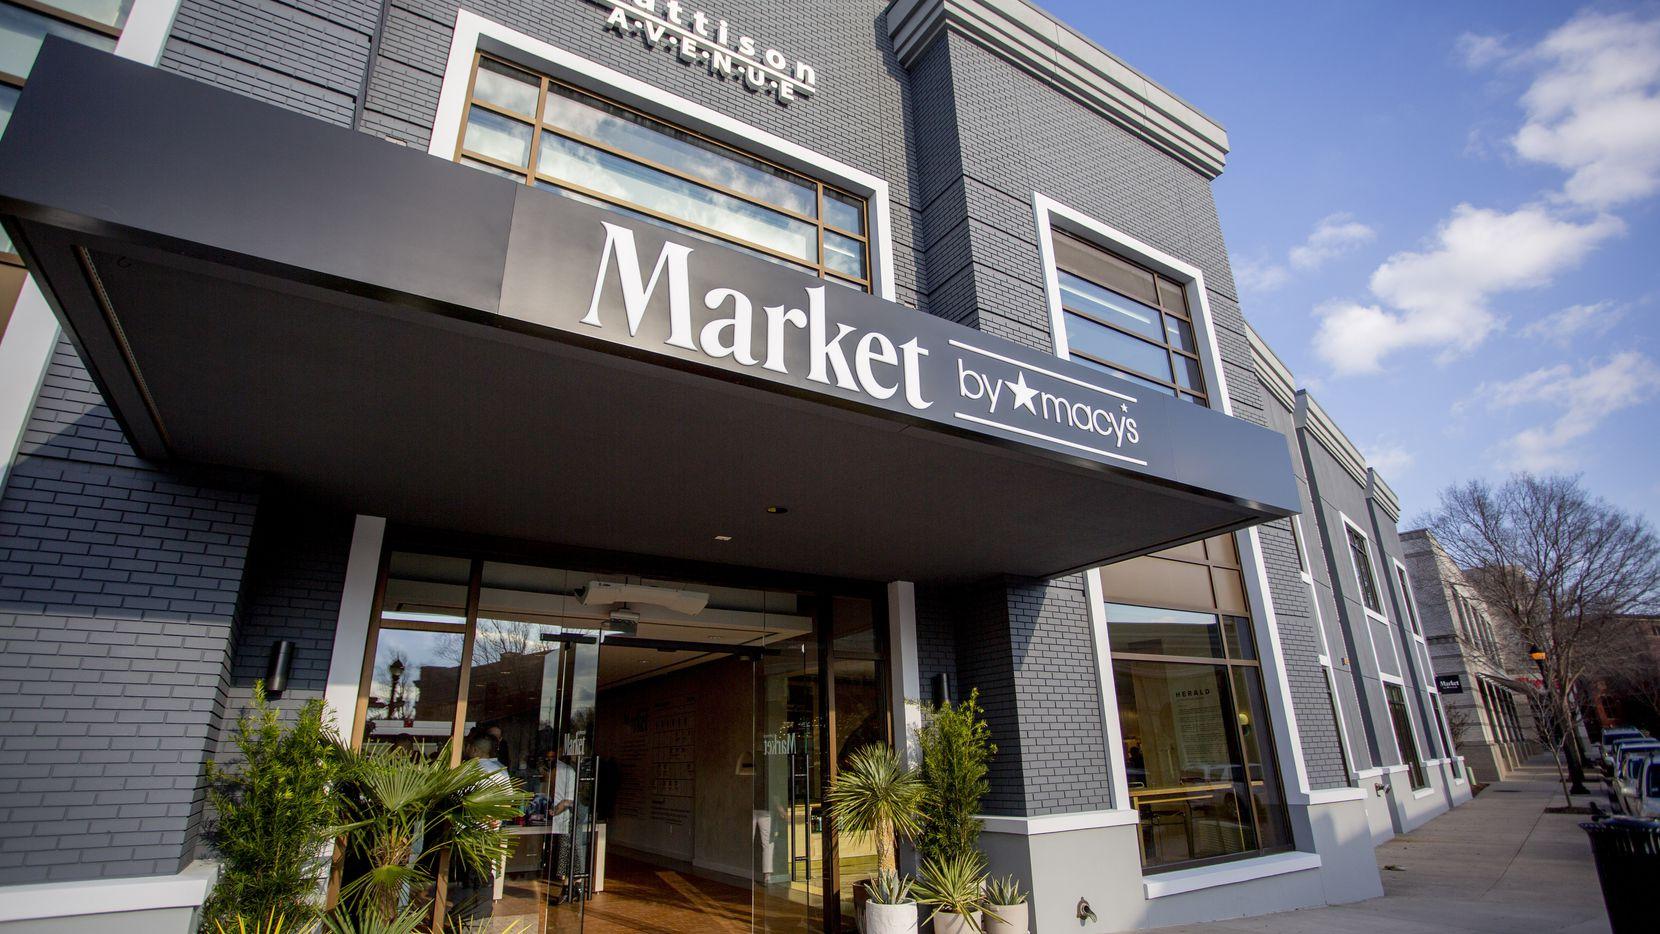 Market by Macy's opened in February in Southlake.